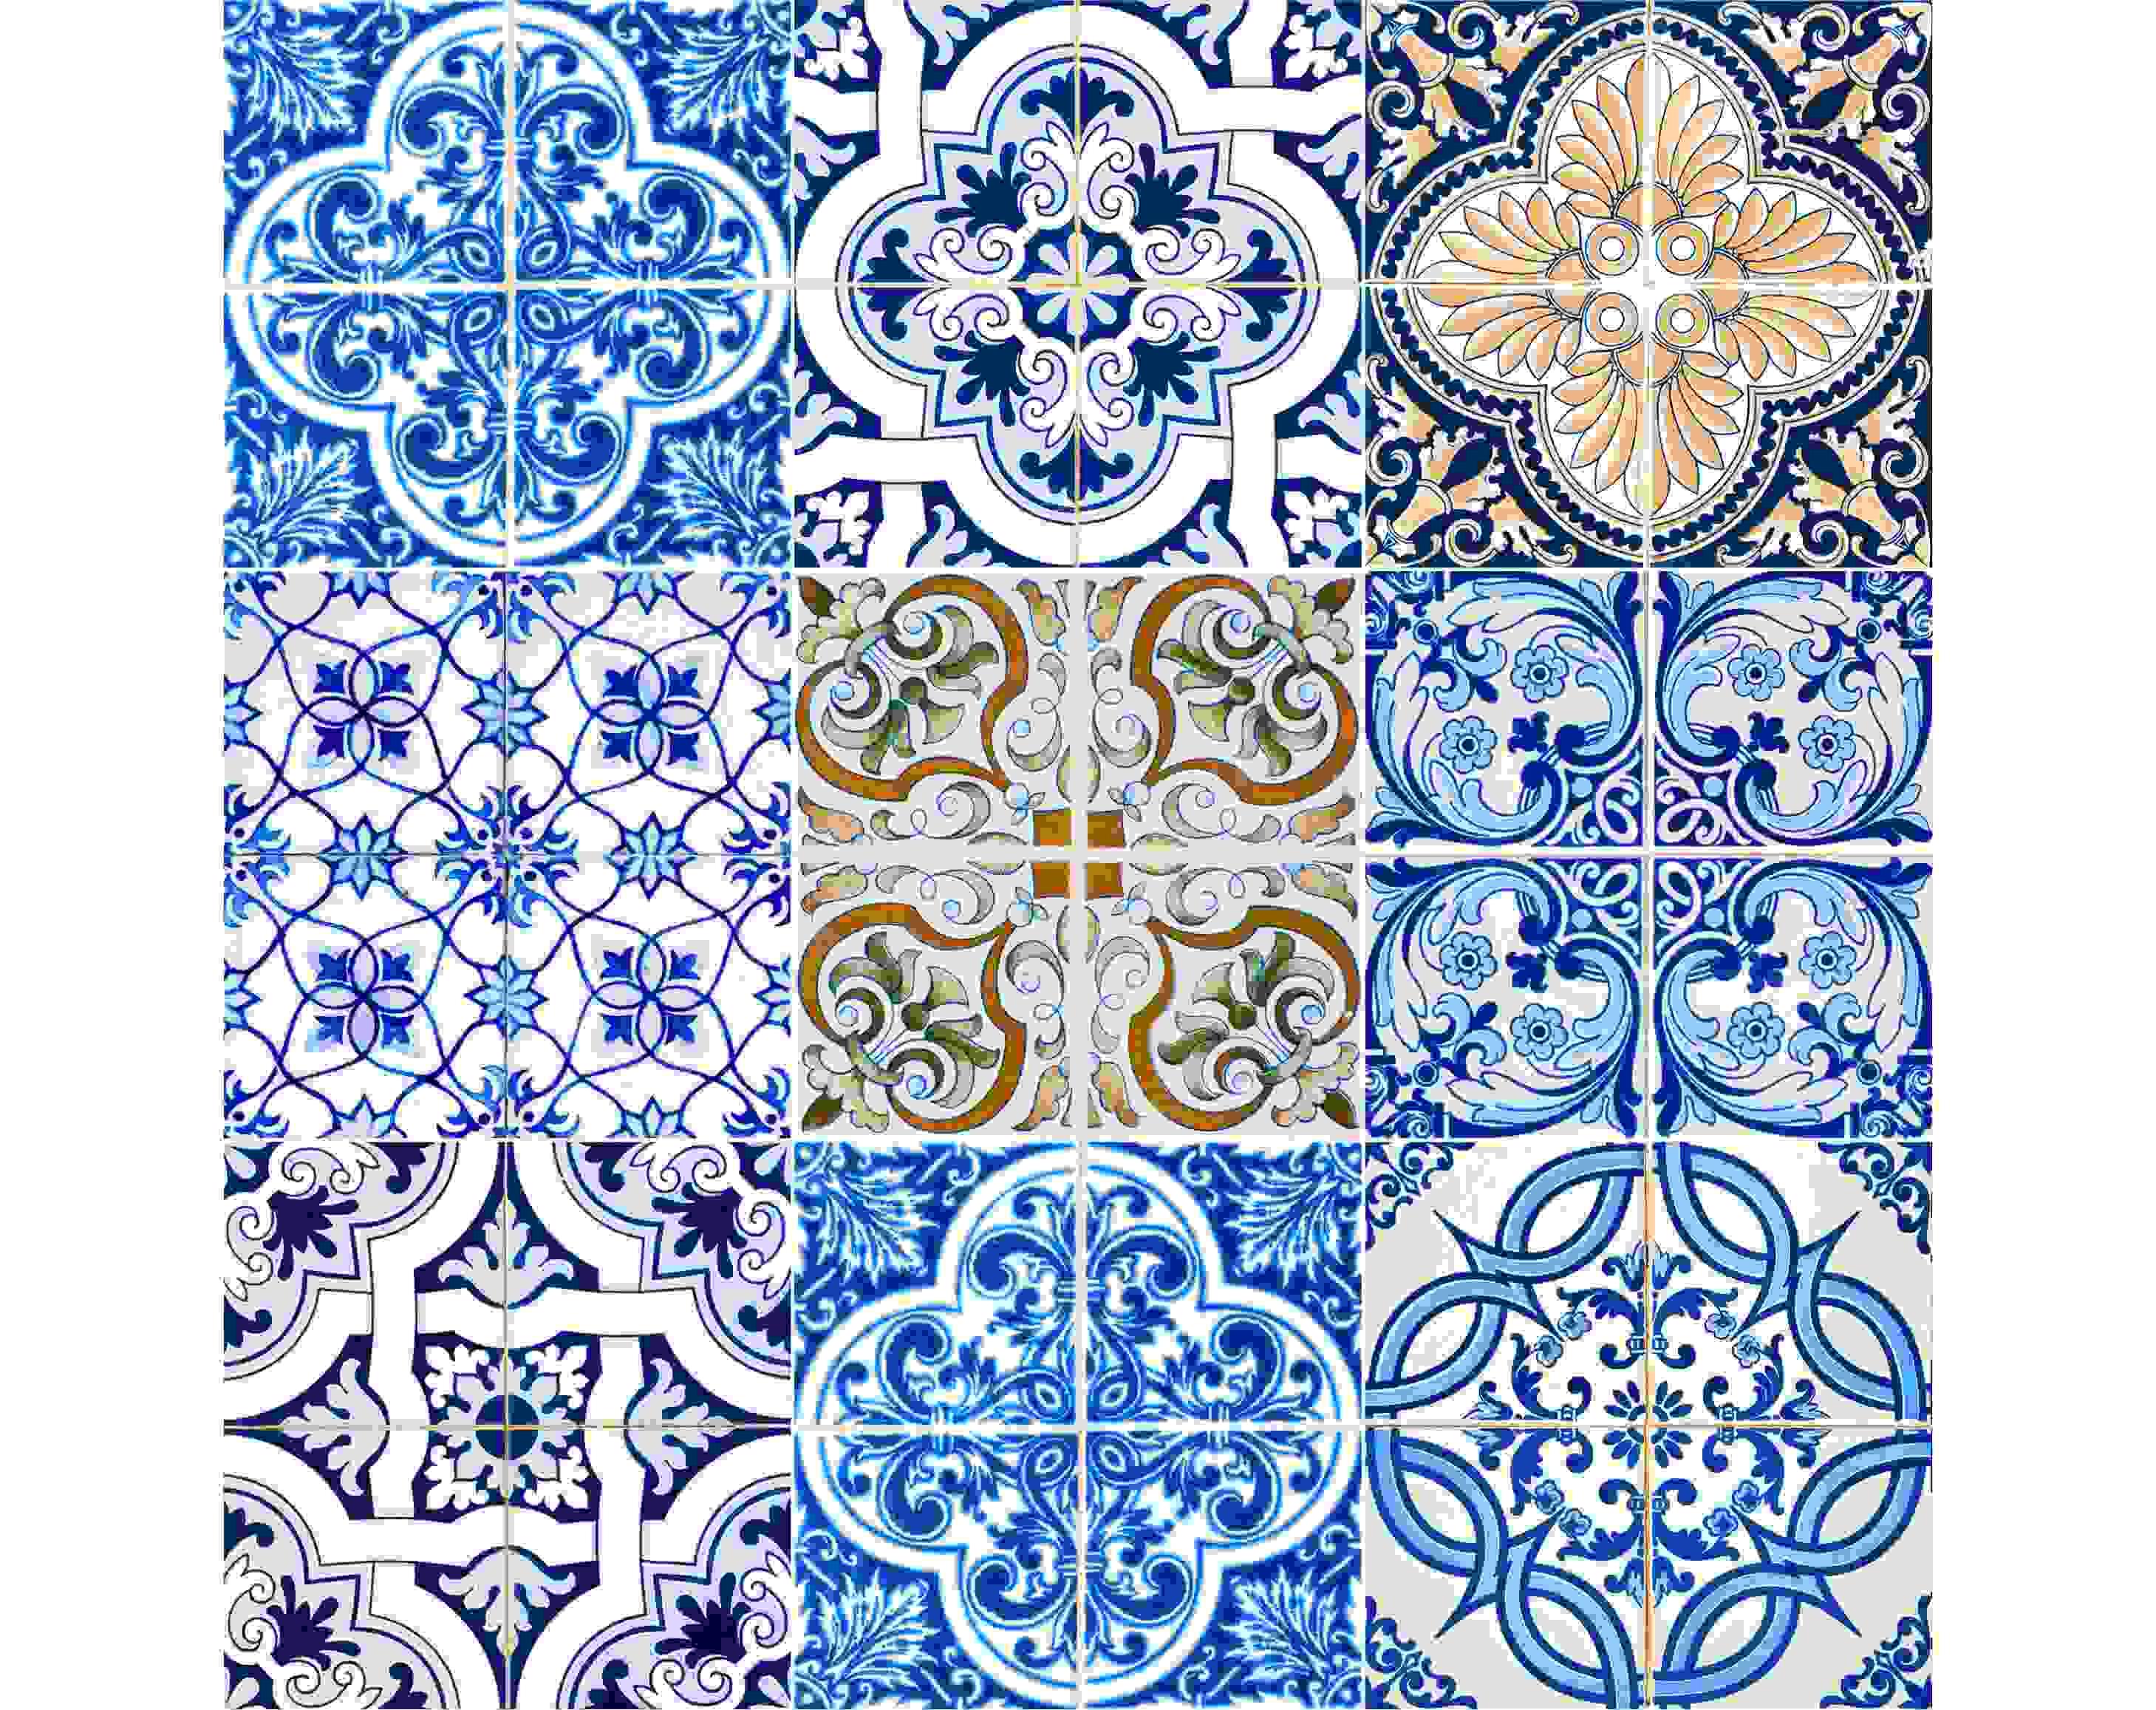 "5"" X 5"" Dianna Mutli Mosaic Peel and Stick Tiles"